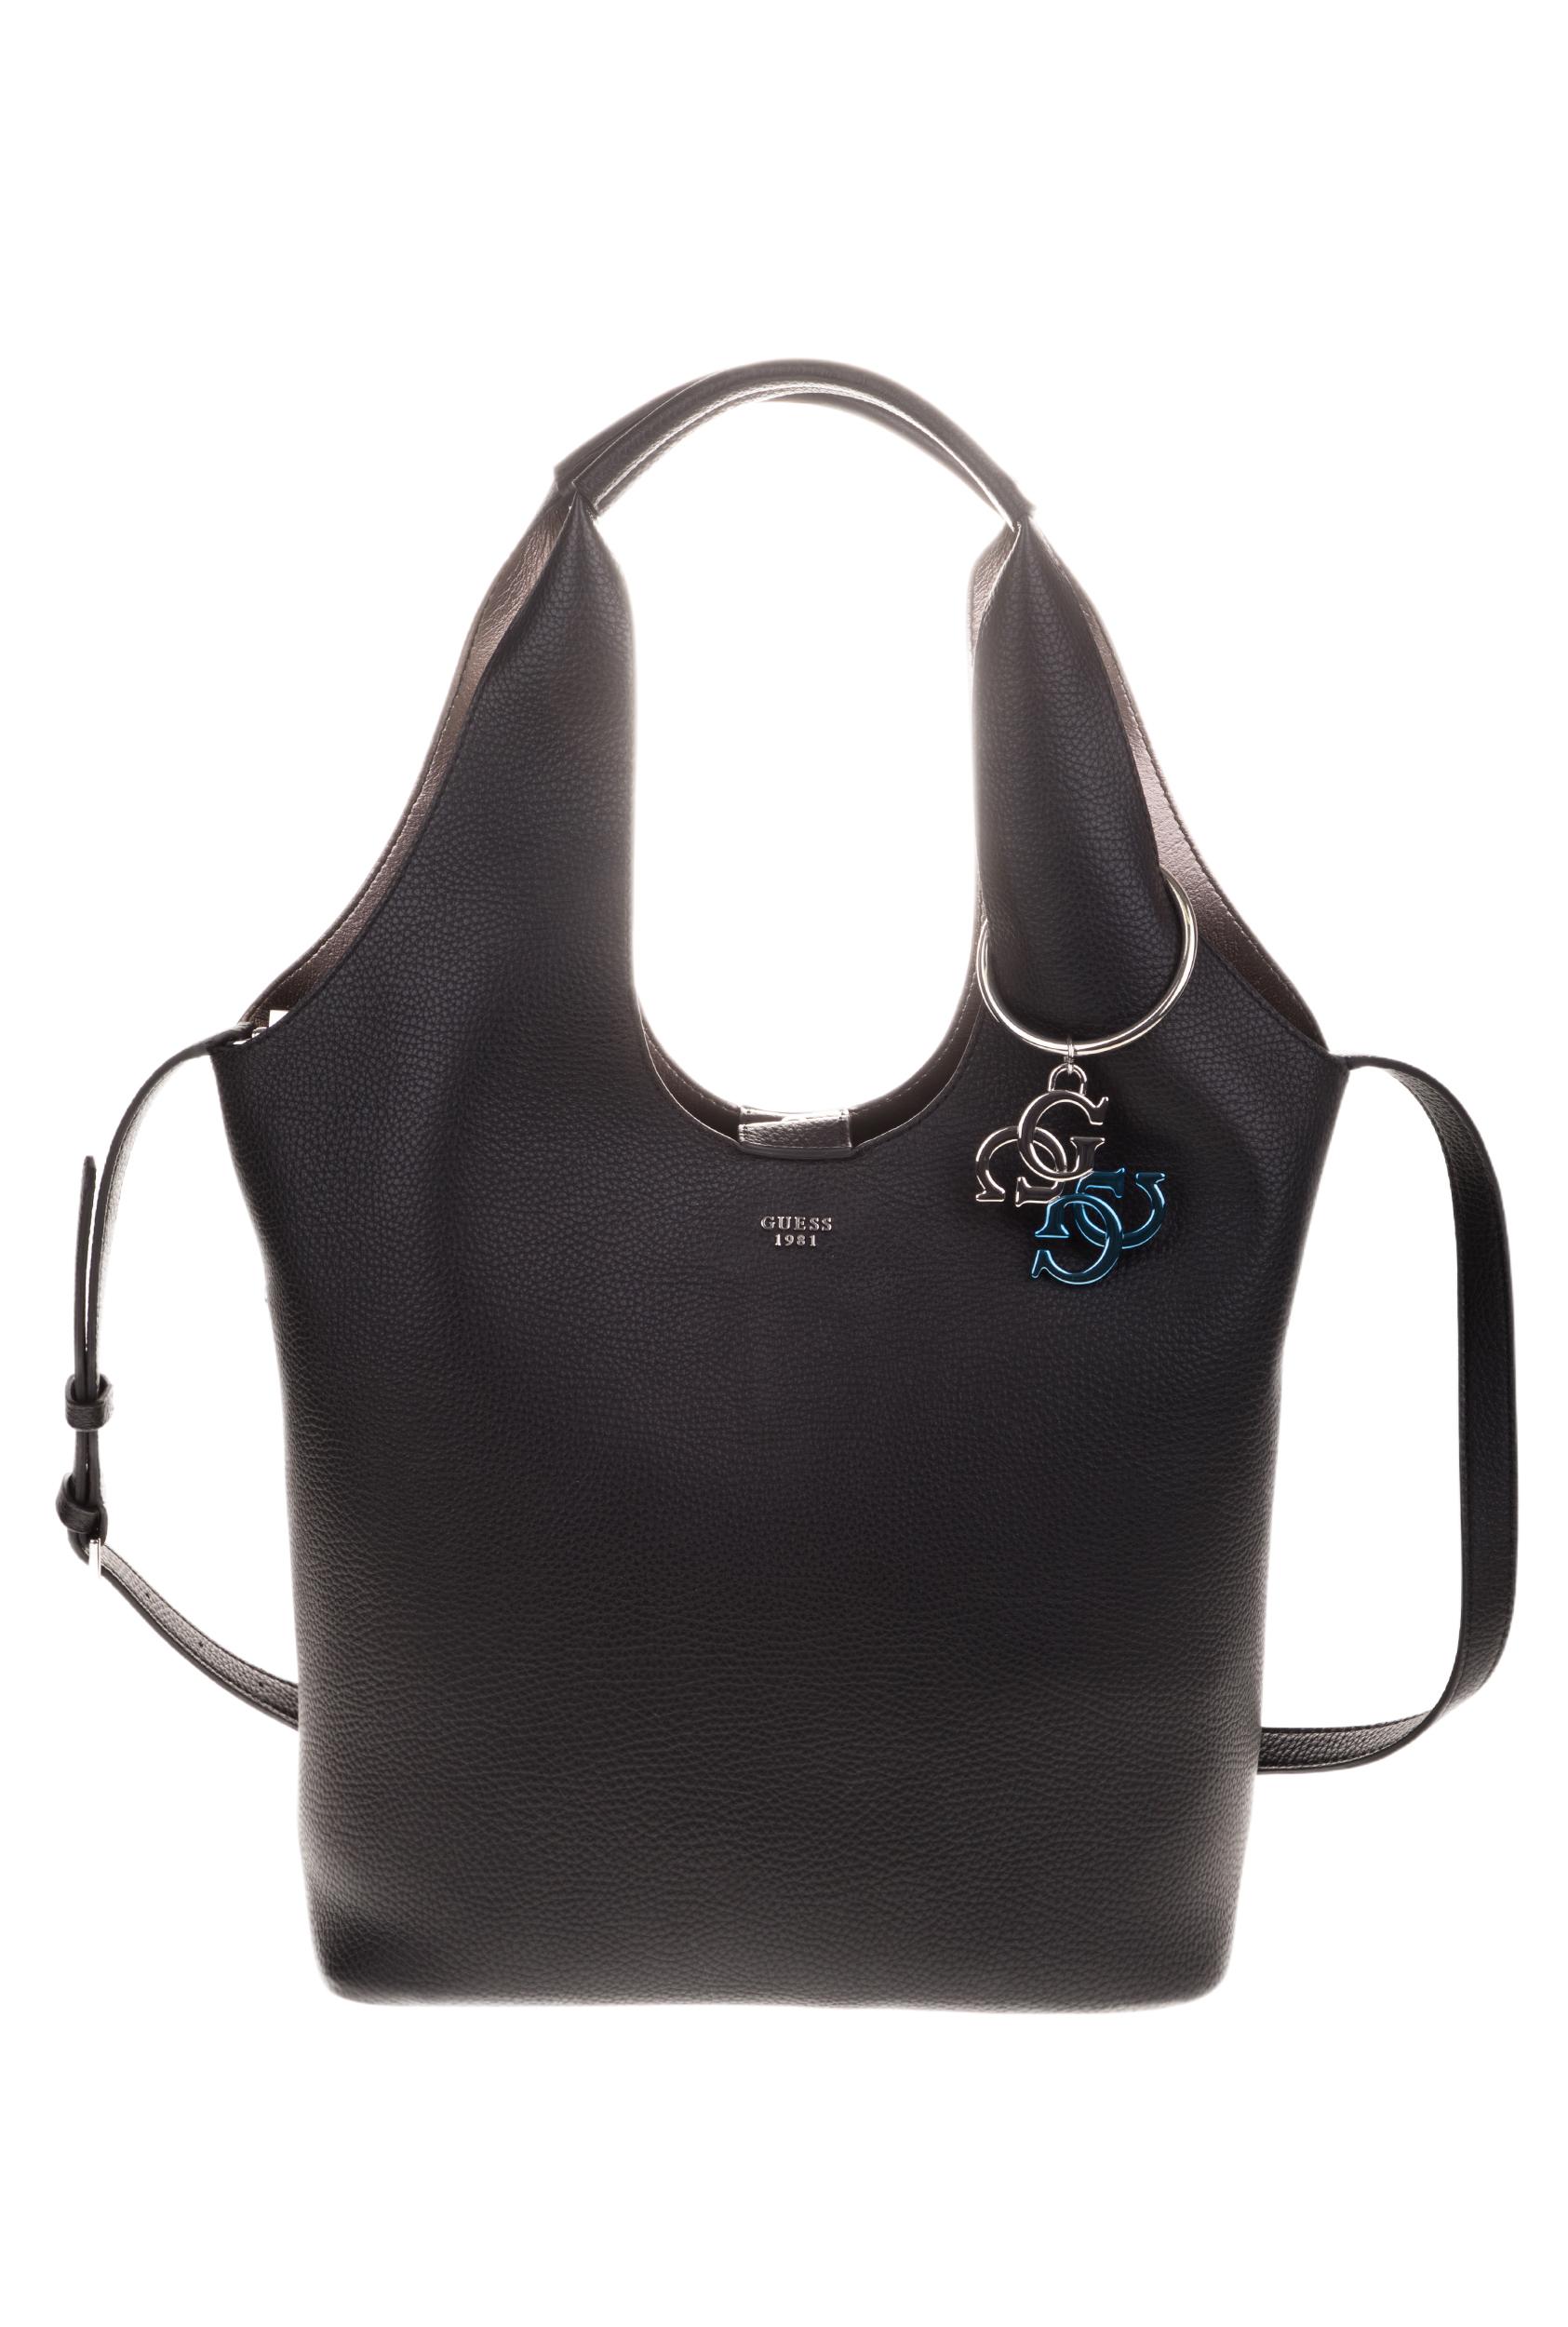 Guess - Κορυφαία προϊόντα για Γυναικείες Τσάντες  467d13a323f